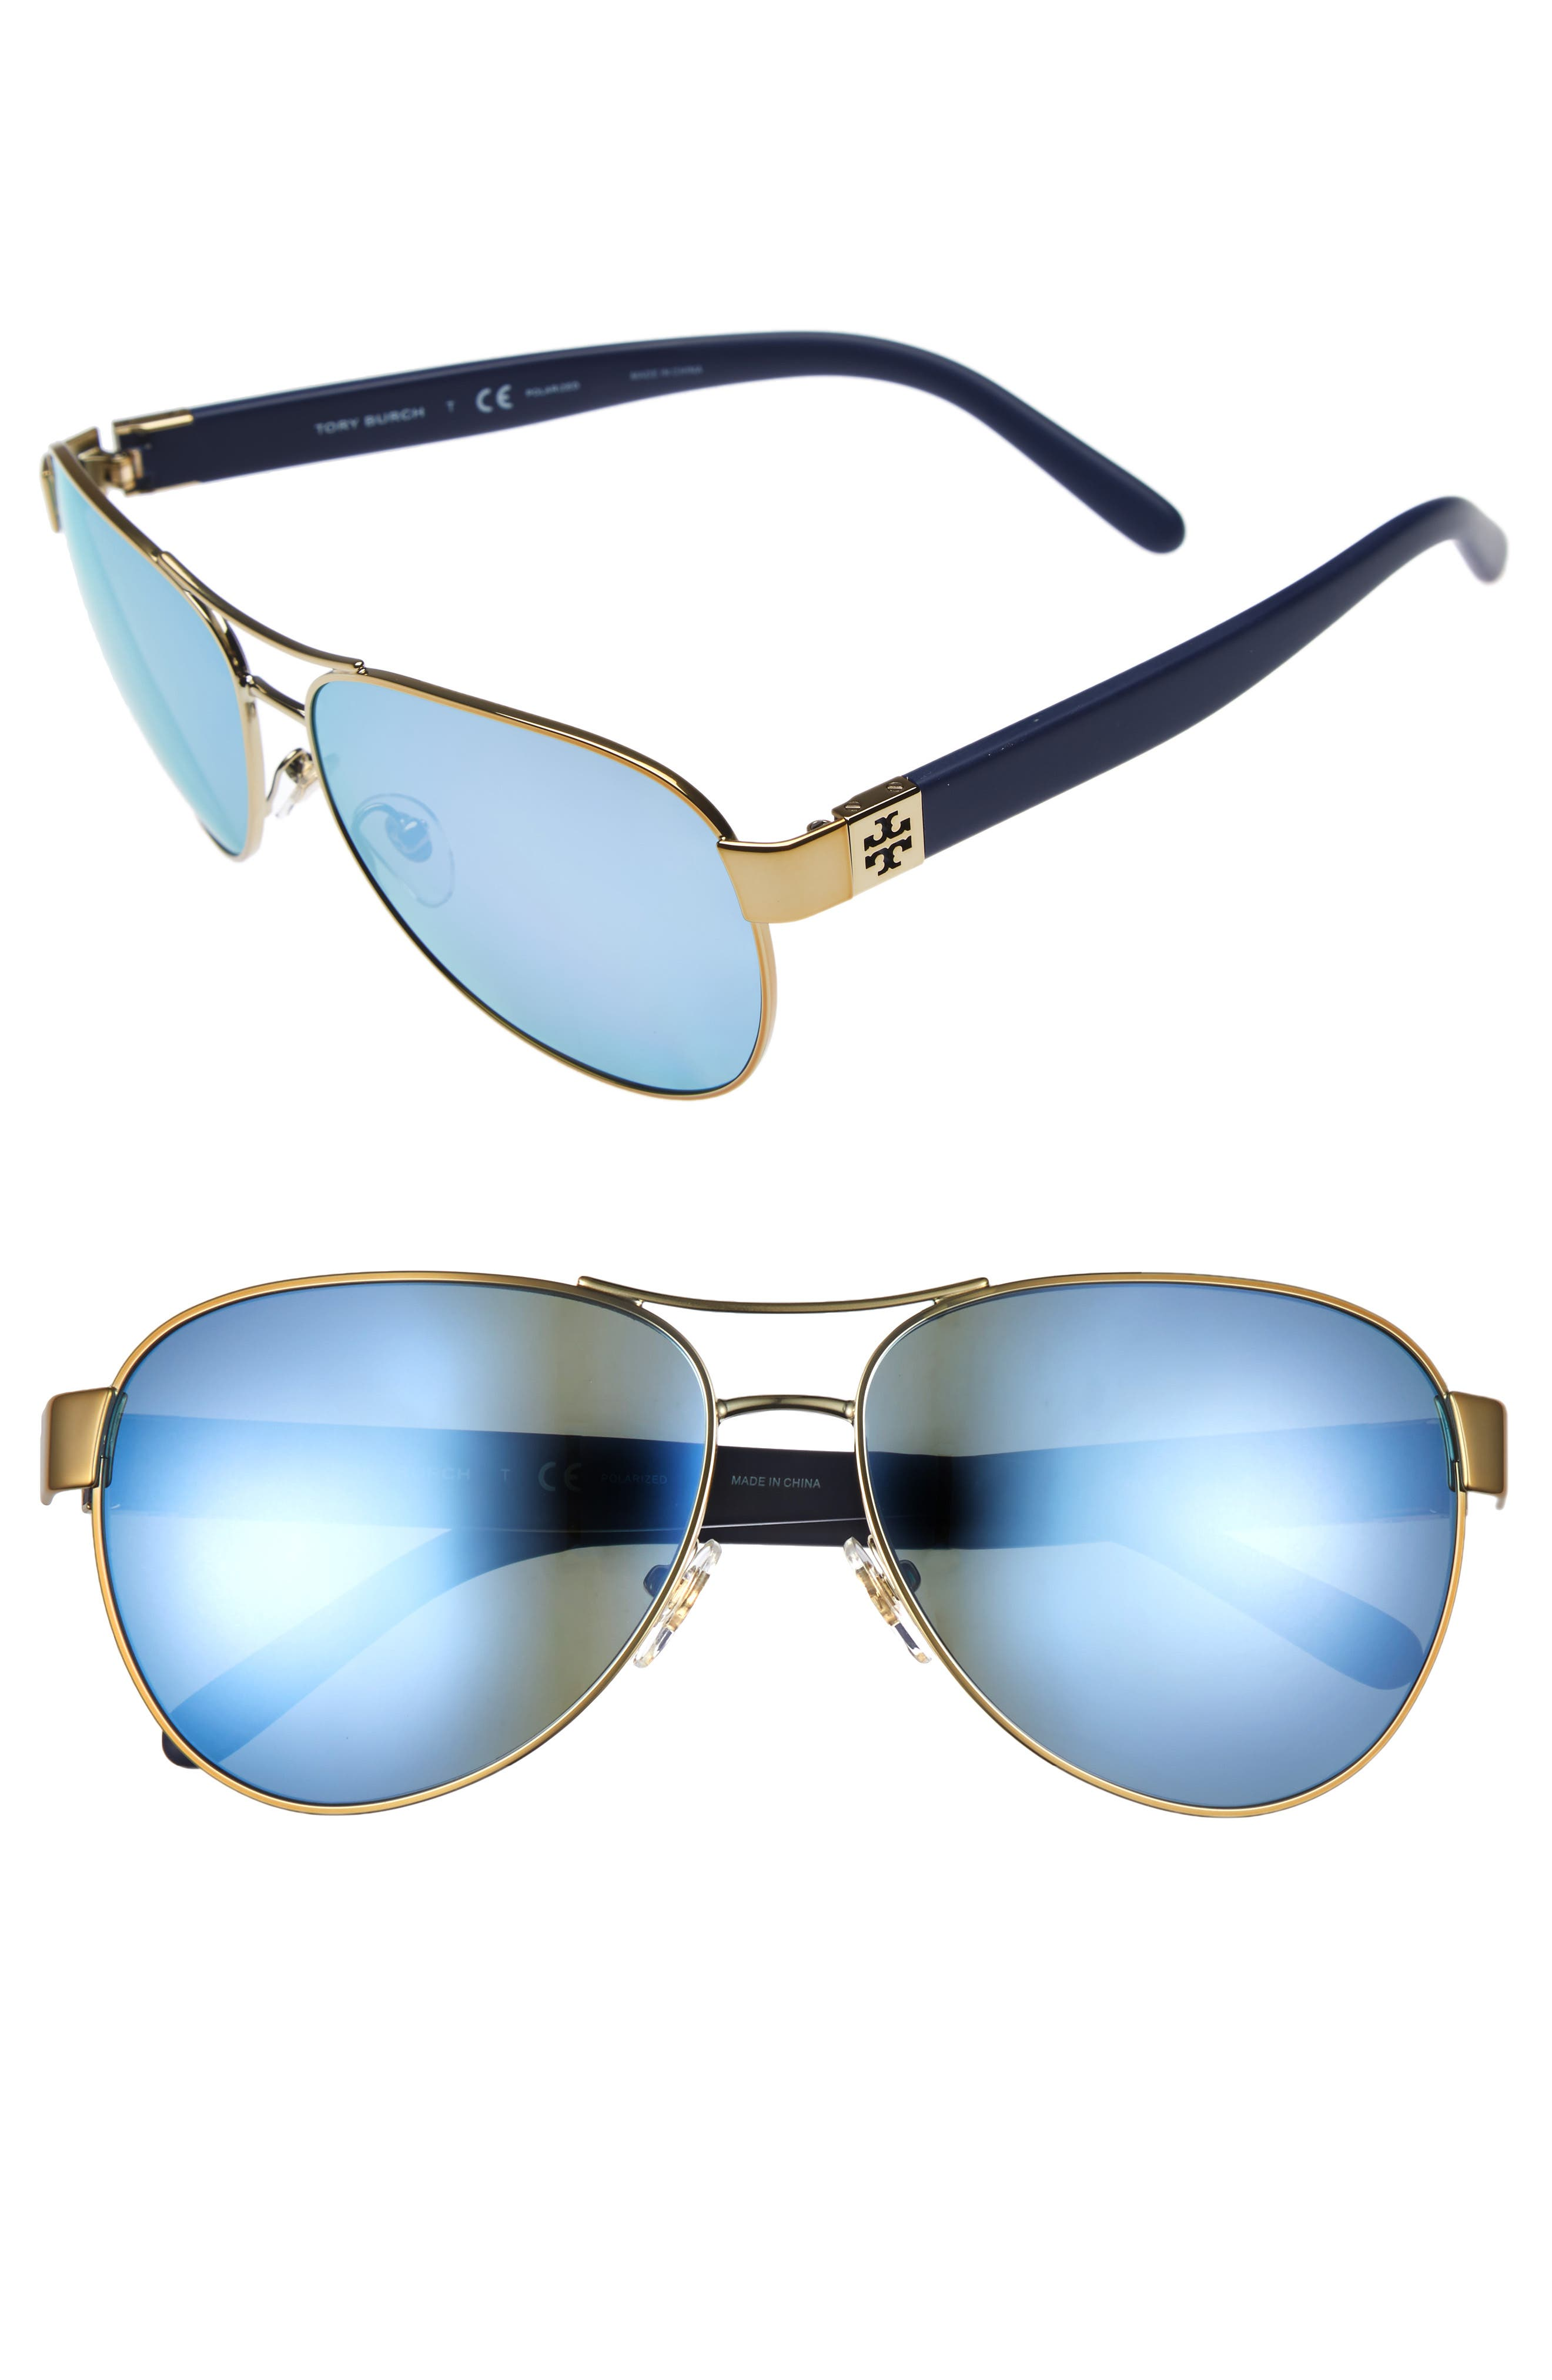 60mm Polarized Aviator Sunglasses,                             Main thumbnail 1, color,